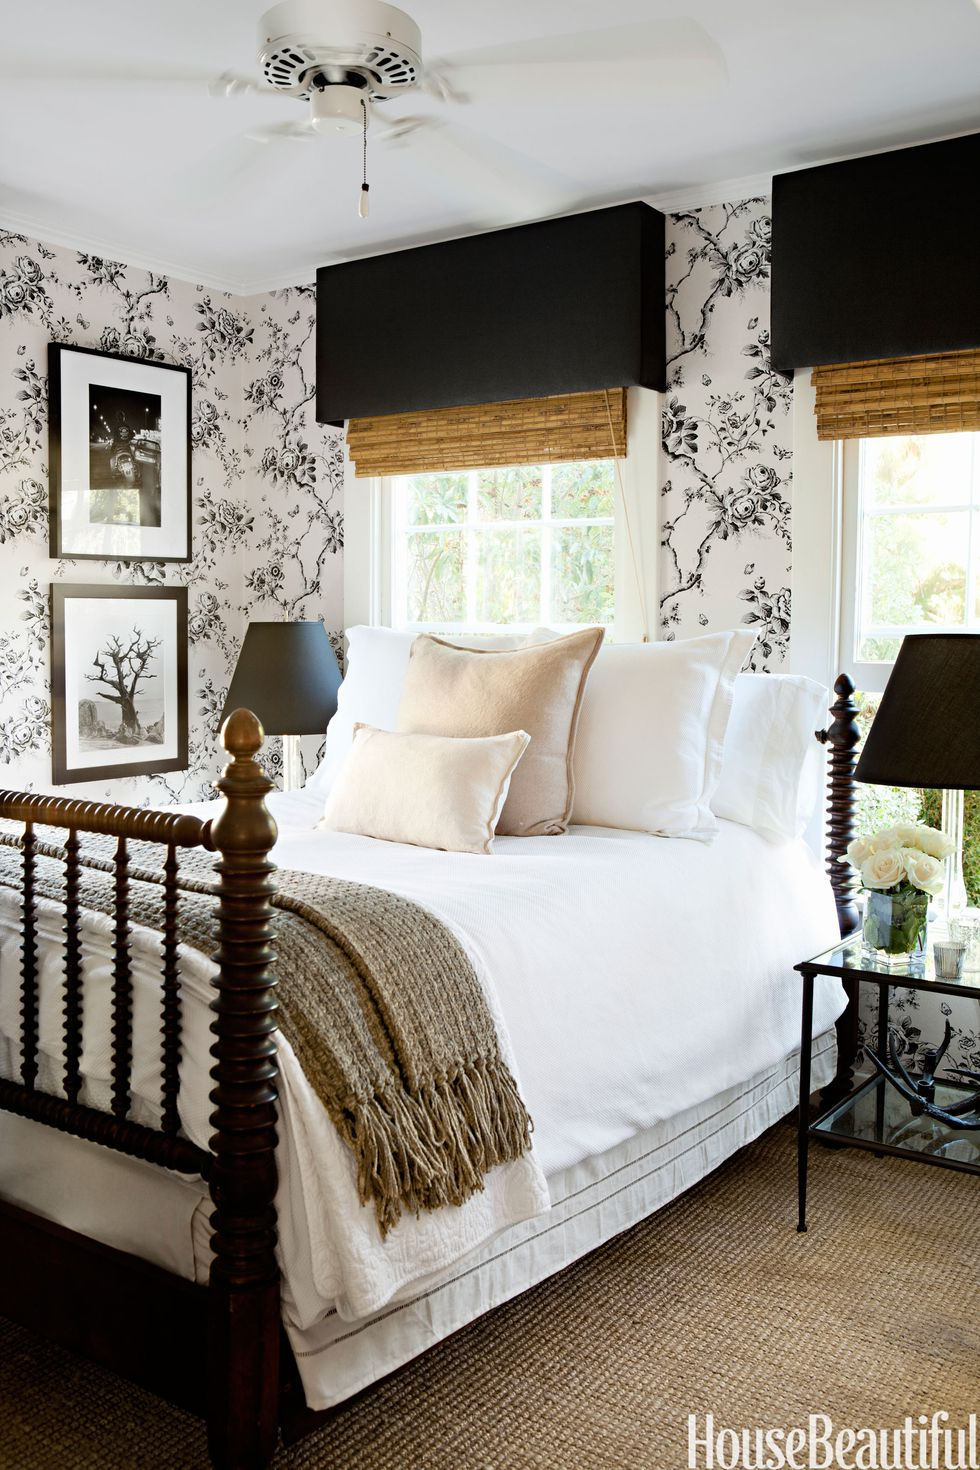 54c0c1030b054_-_14-hbx-ralph-lauren-ashfield-floral-wallpaper-tobin-0513-s2.jpg